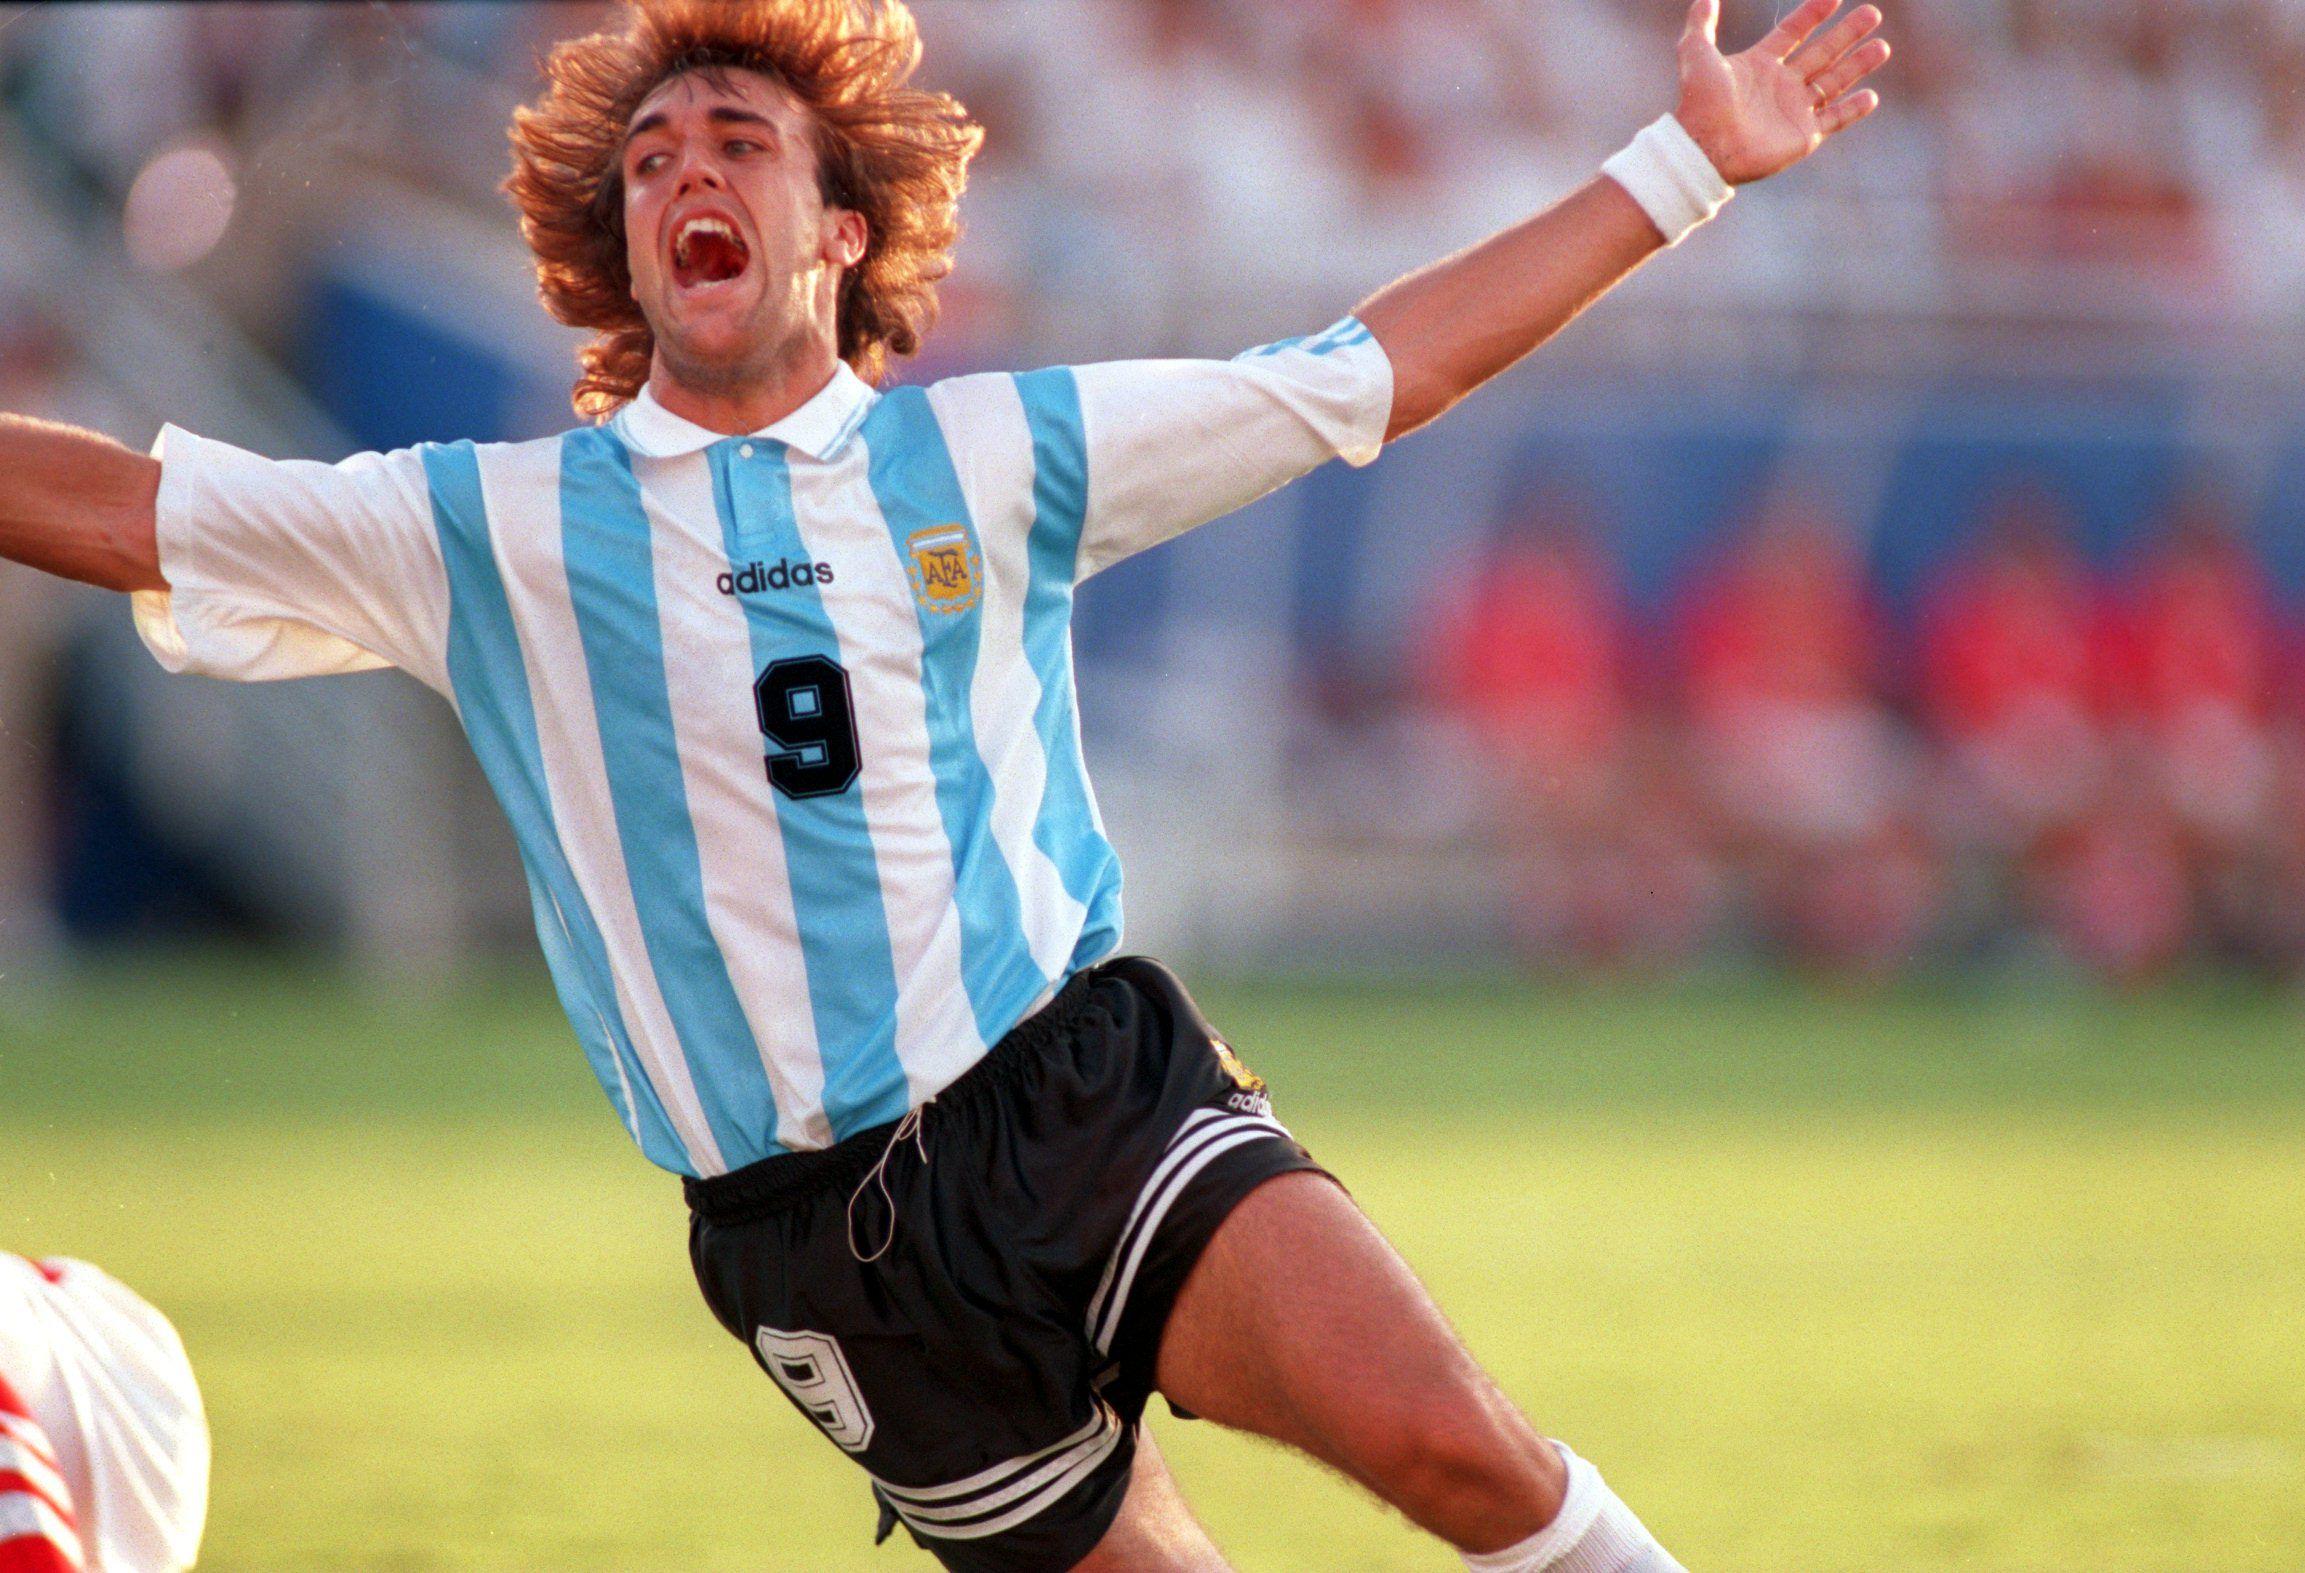 Gabriel Batistuta a.k.a. Batigol. | Sports | Pinterest ...